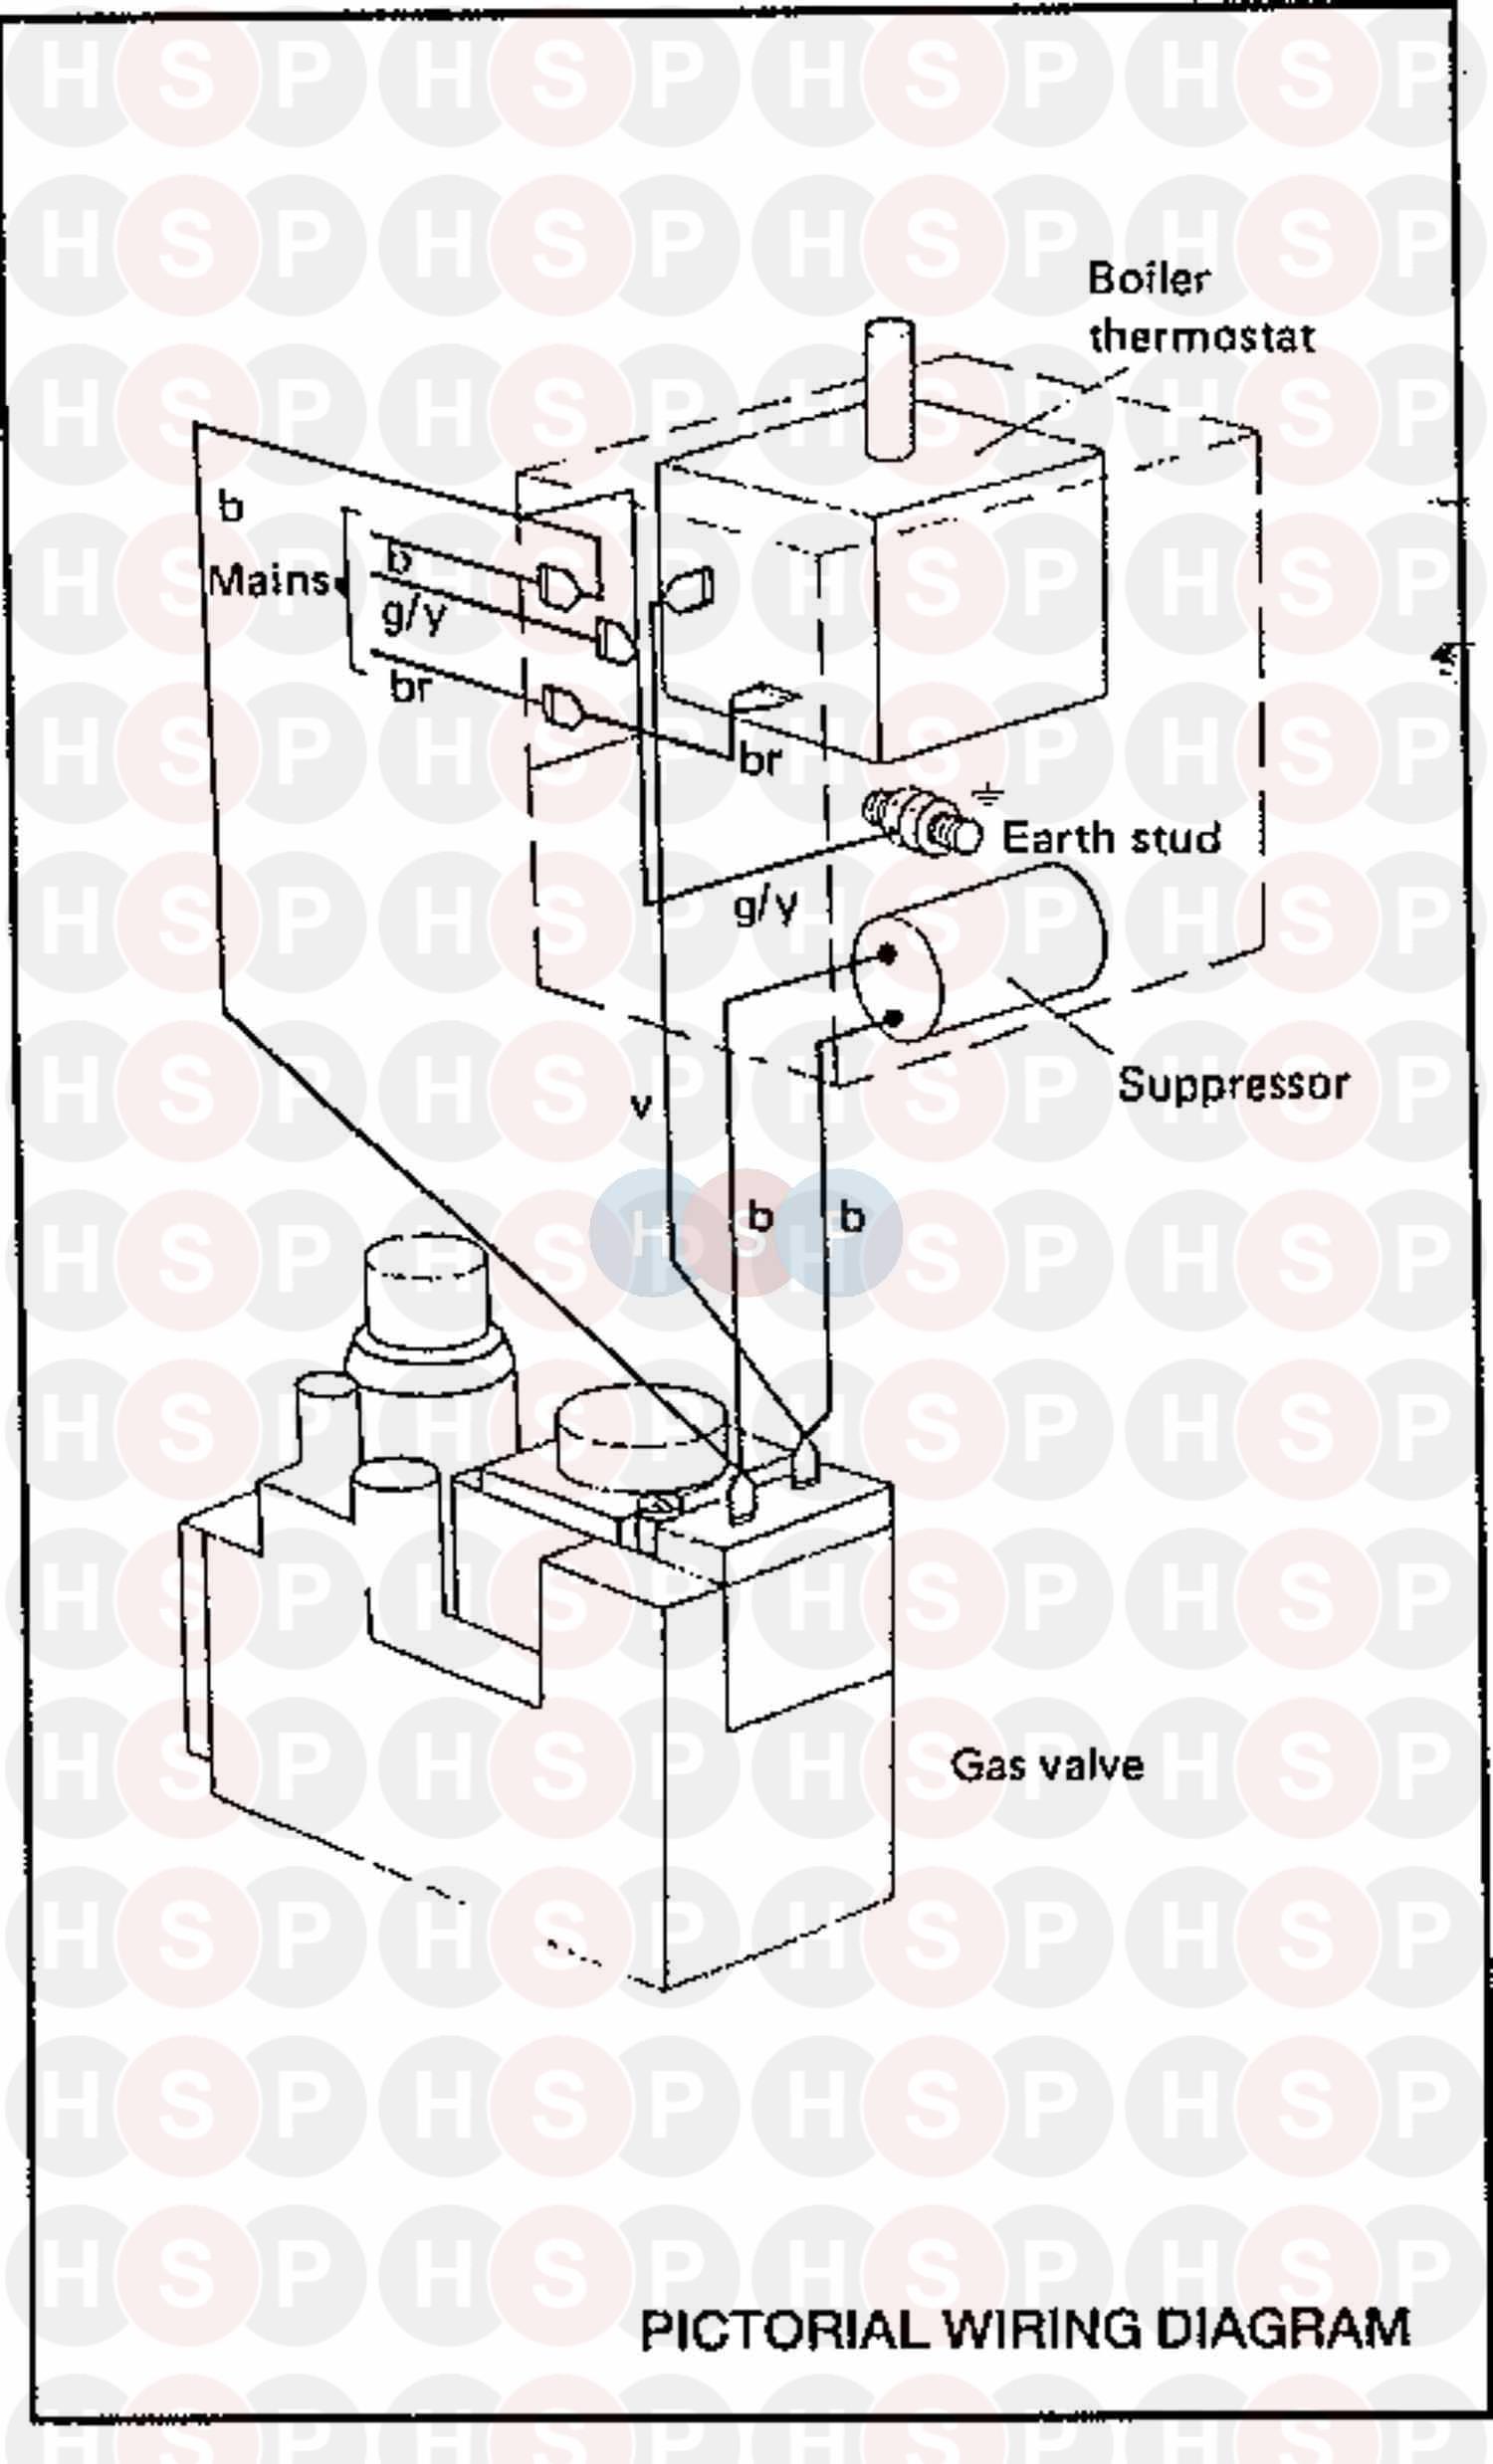 Ideal CONCORD WLX RS 50 (WIRING DIAGRAM 2)Diagram